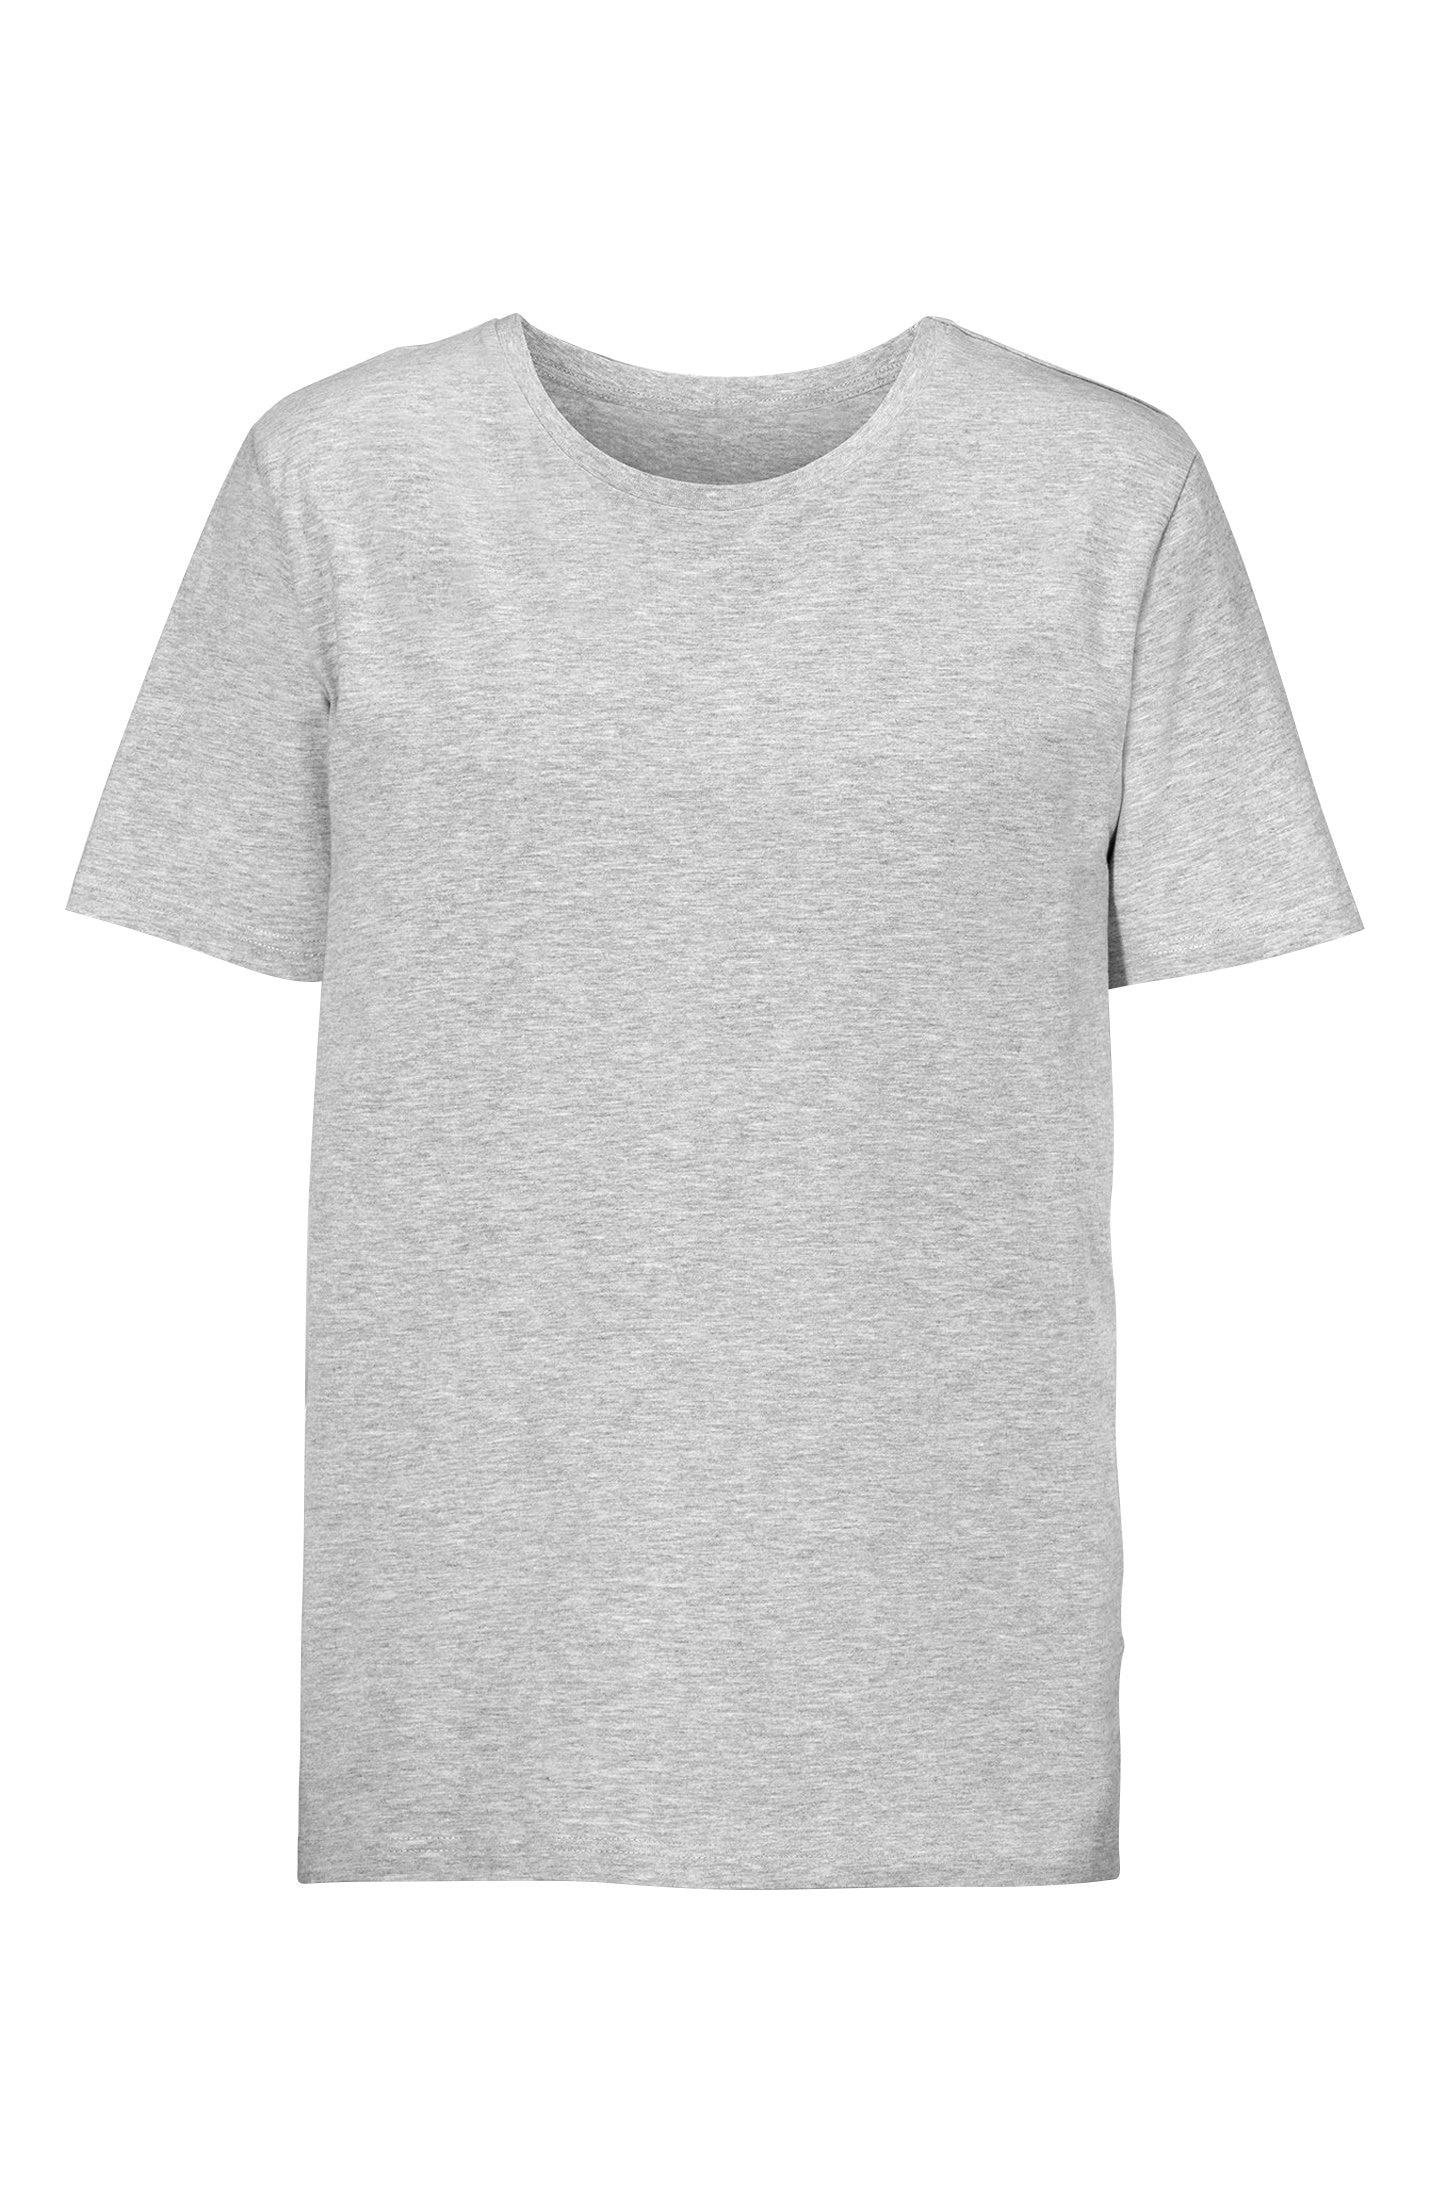 T-shirt 2 sztuki